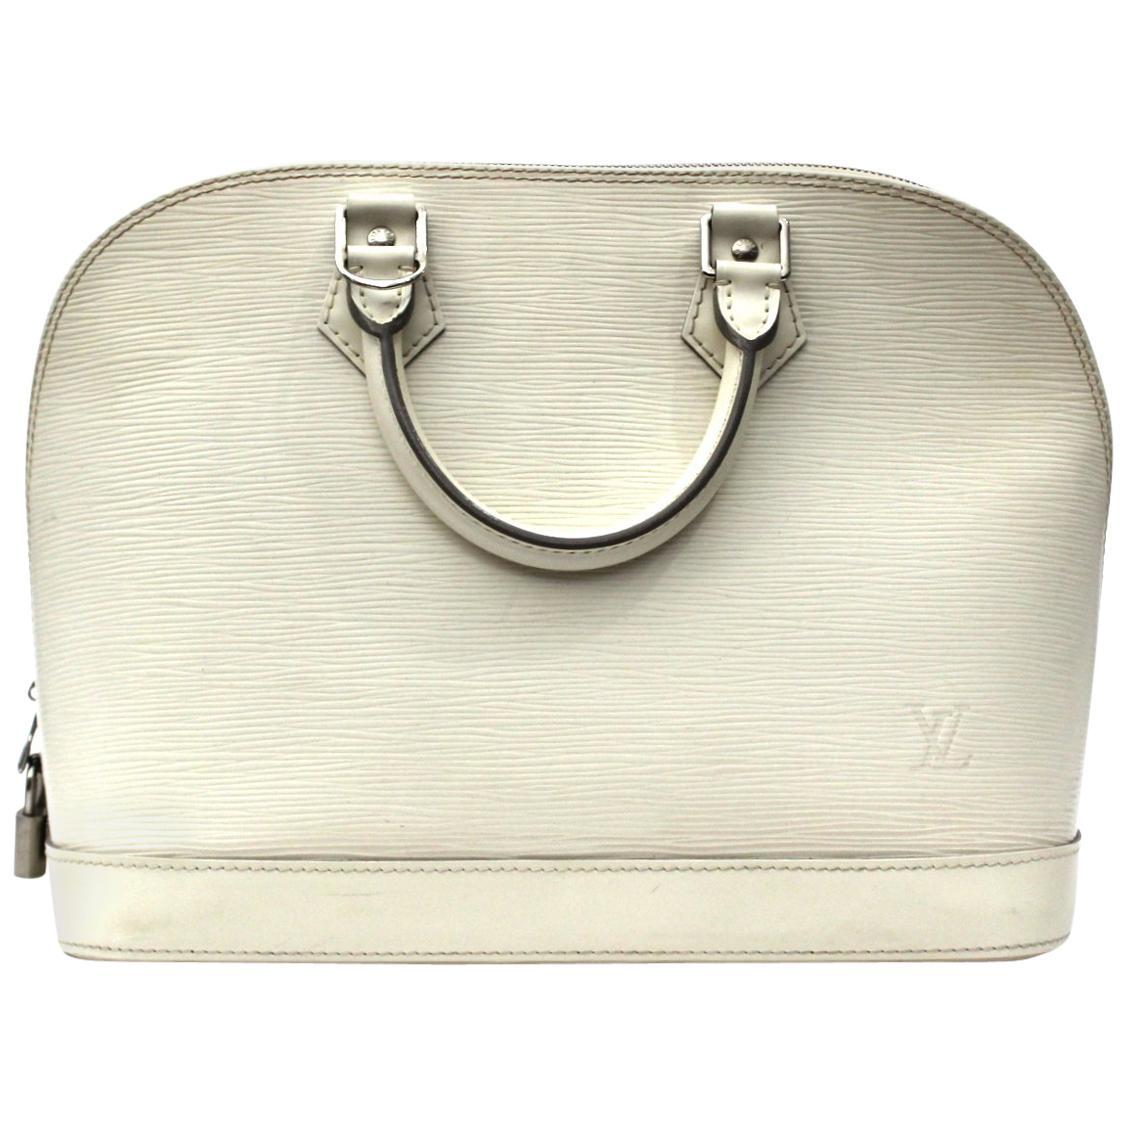 2007 Loui Vuitton Epi Leather Alma PM Bag